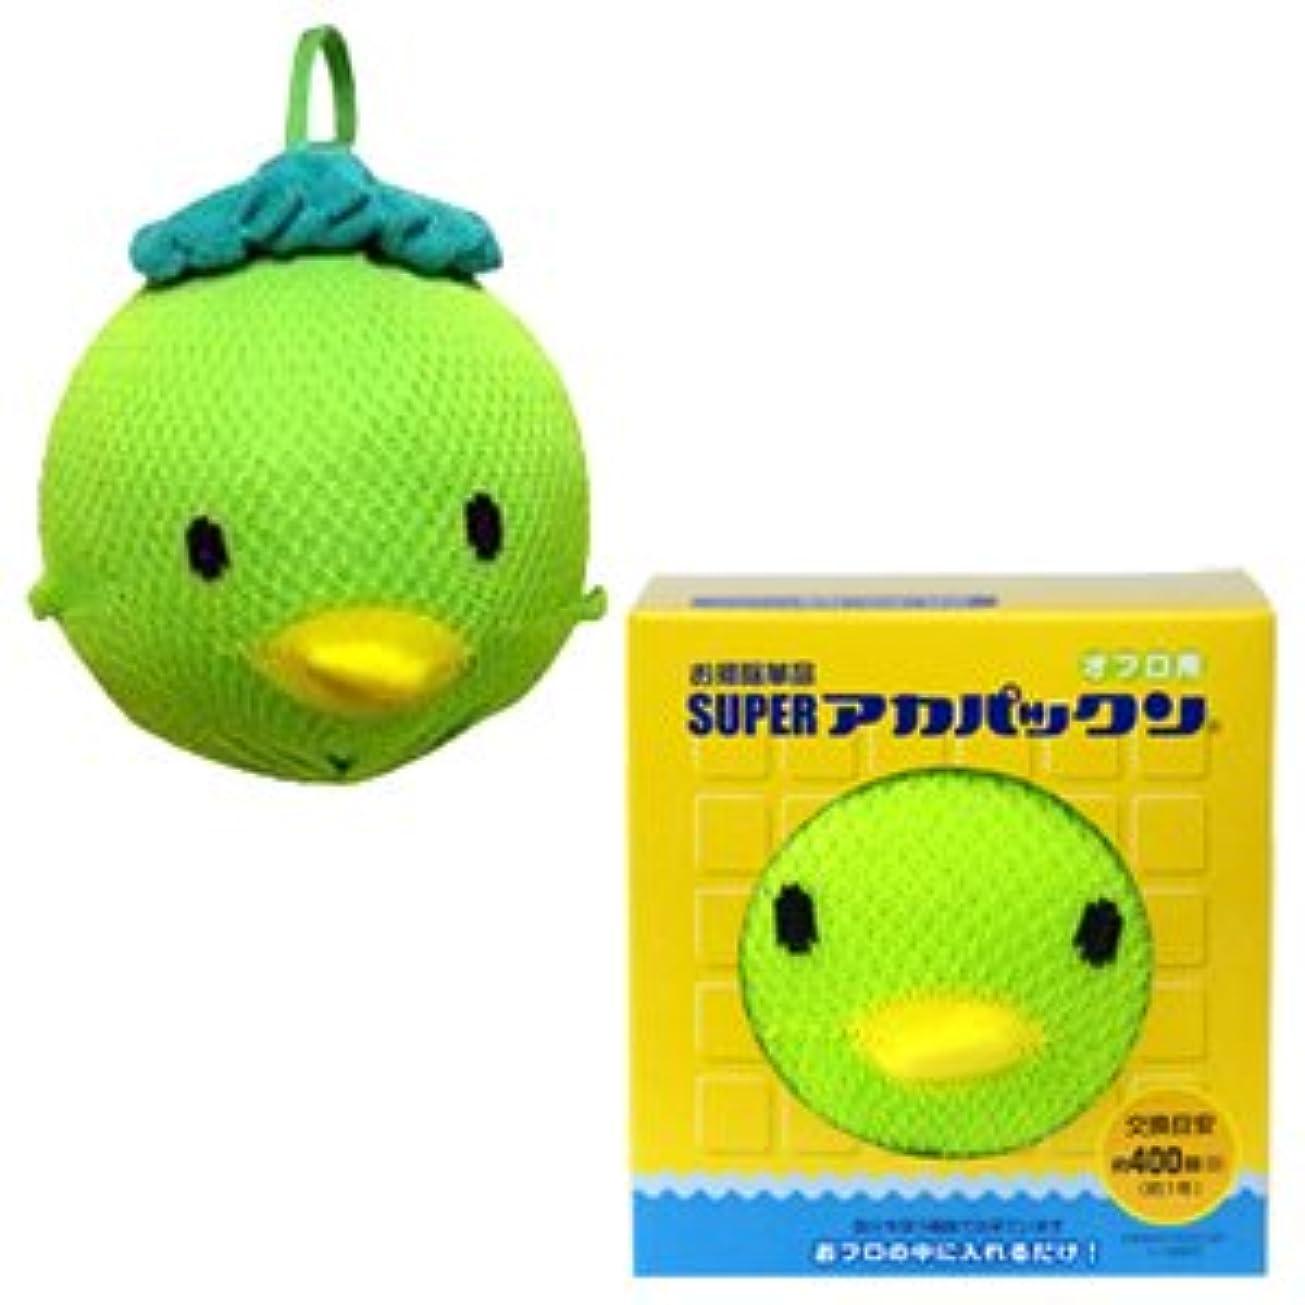 SUPERアカパックン オフロ用 グリーン